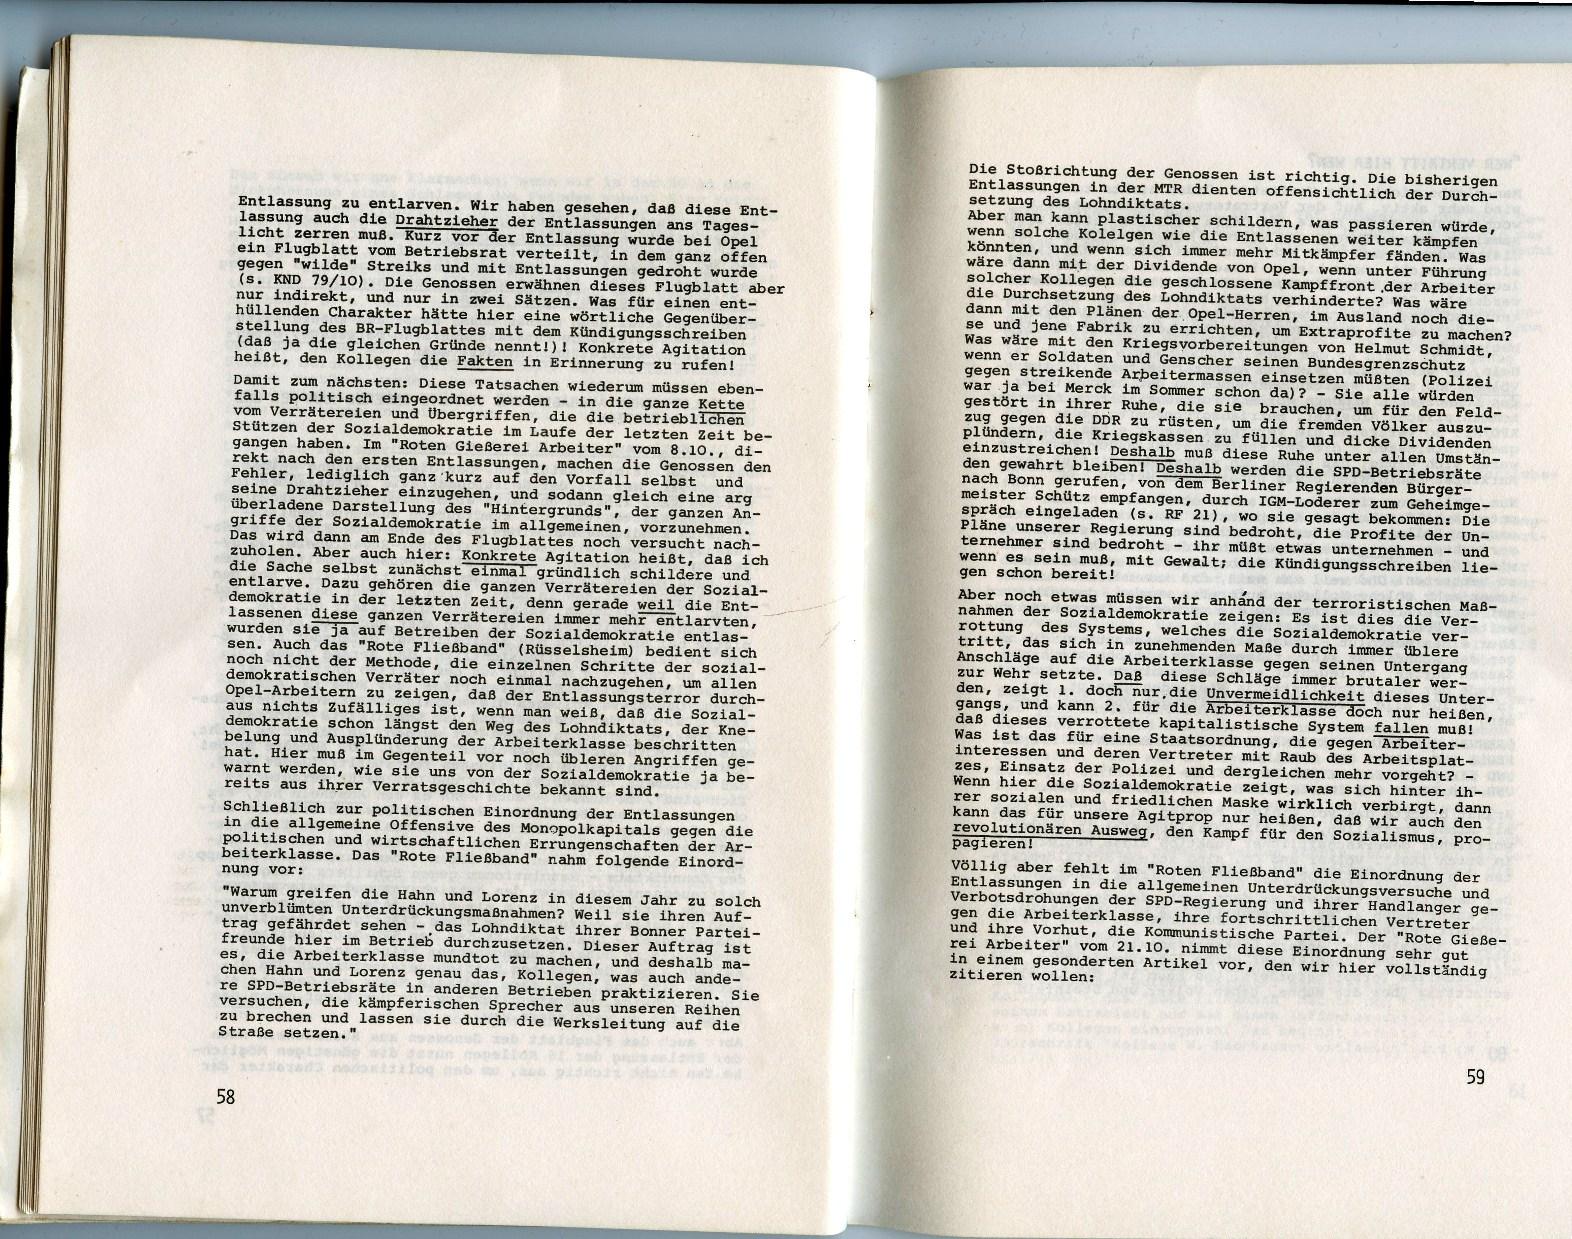 ZB_Parteiarbeiter_1971_09_30